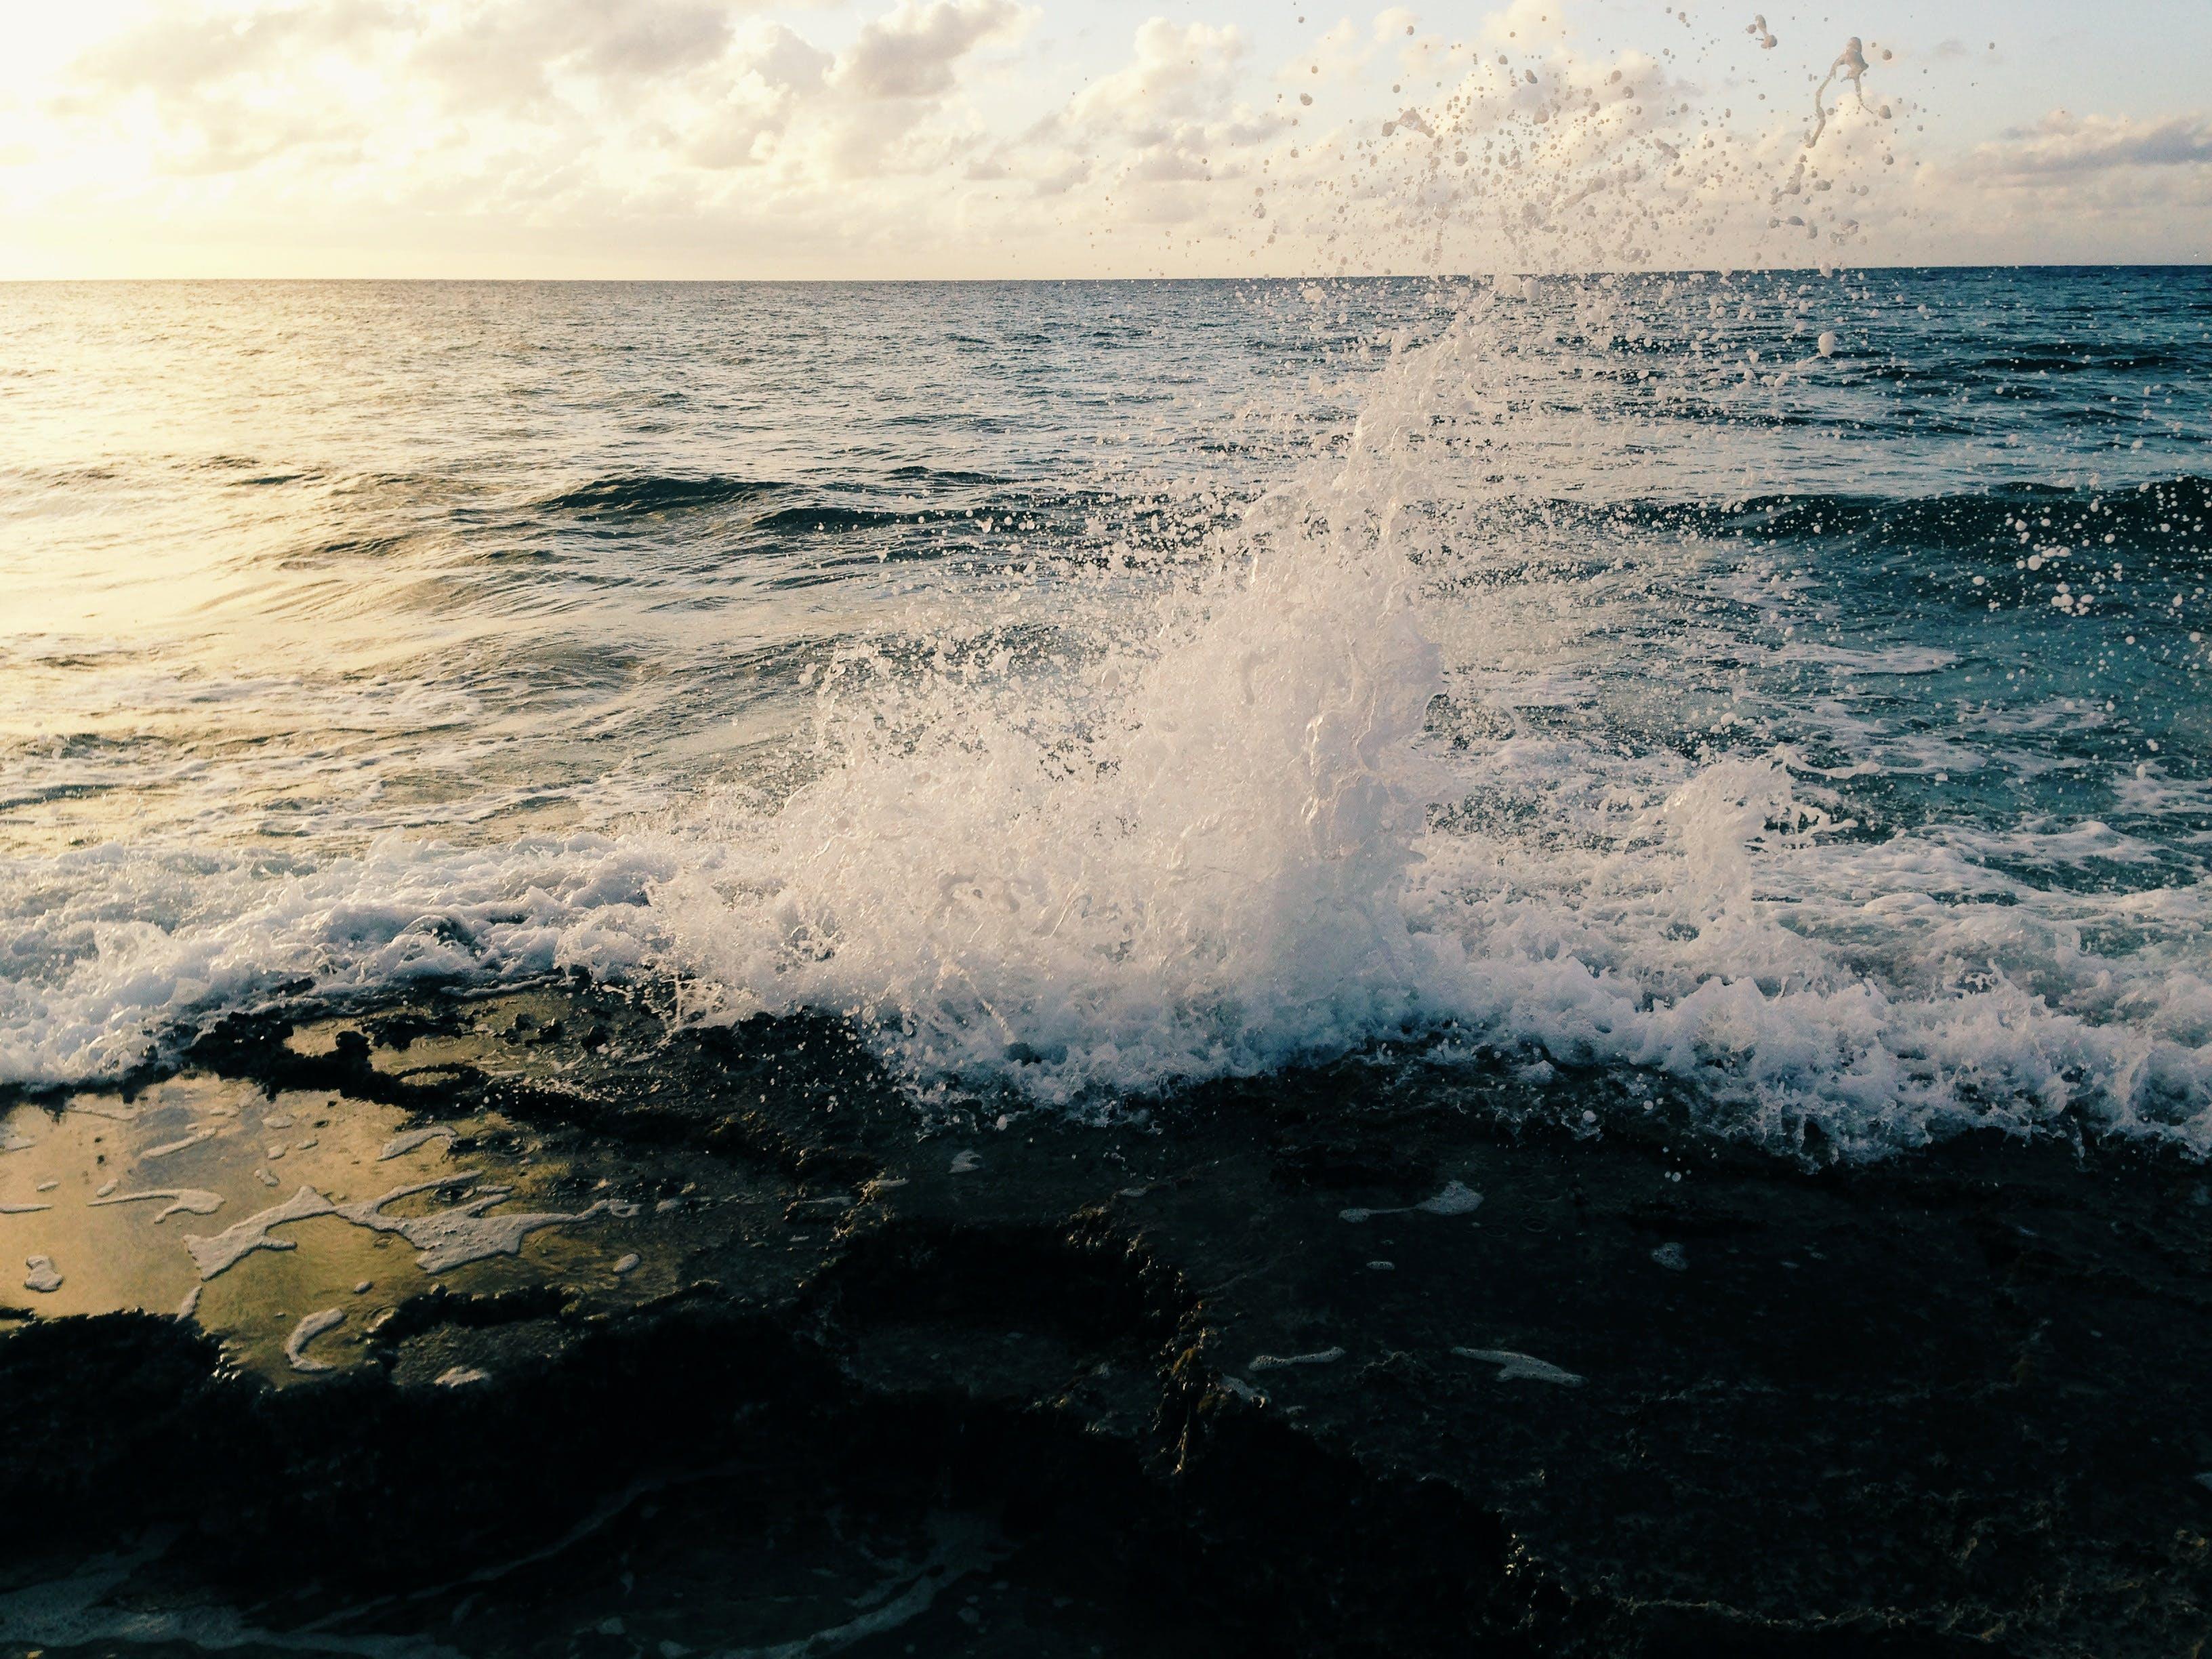 Seashore on Daytime